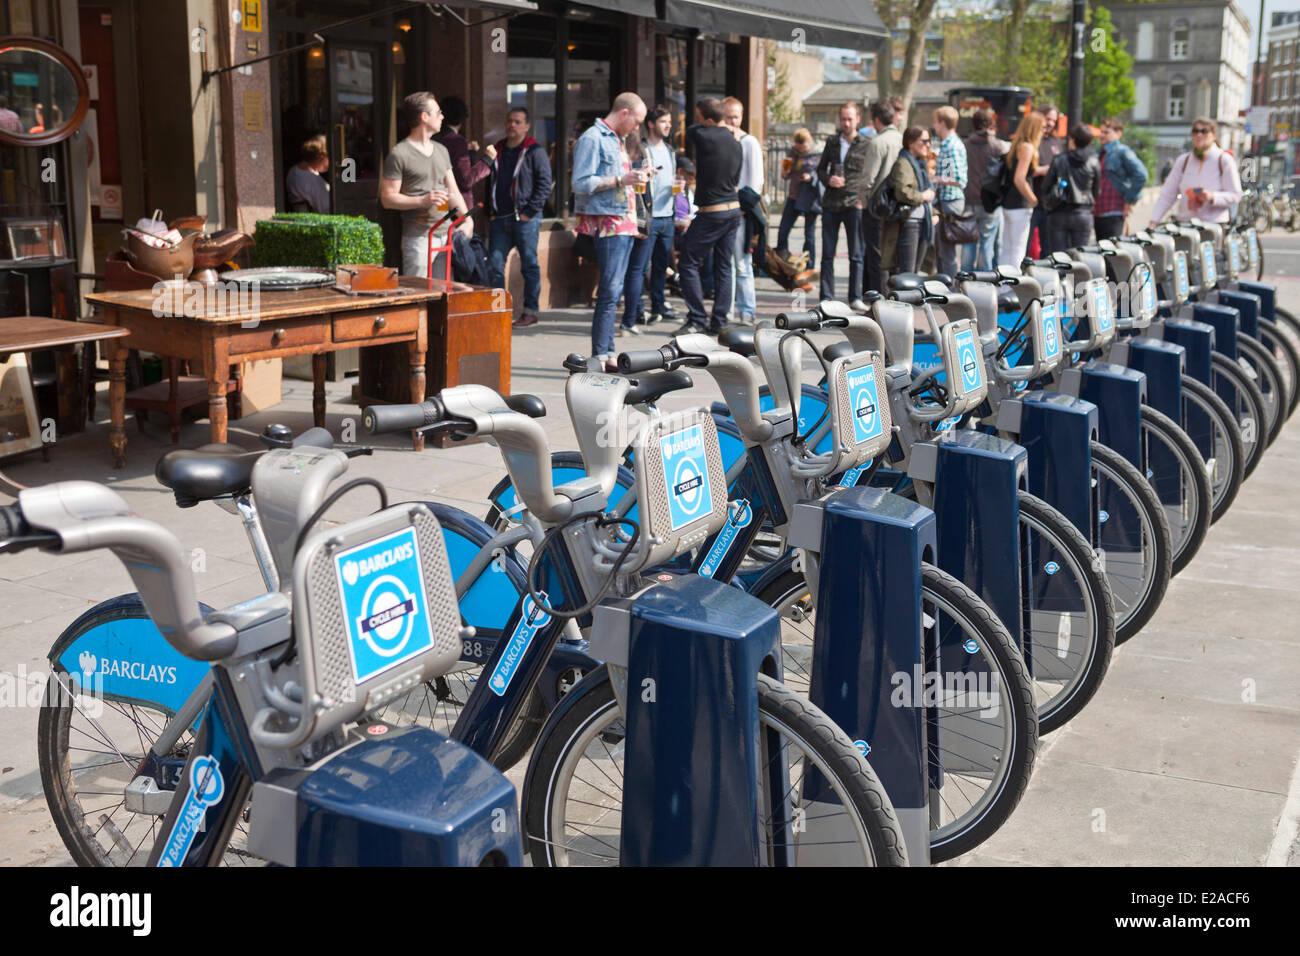 United Kingdown, London, East End district, free bike rental - Stock Image